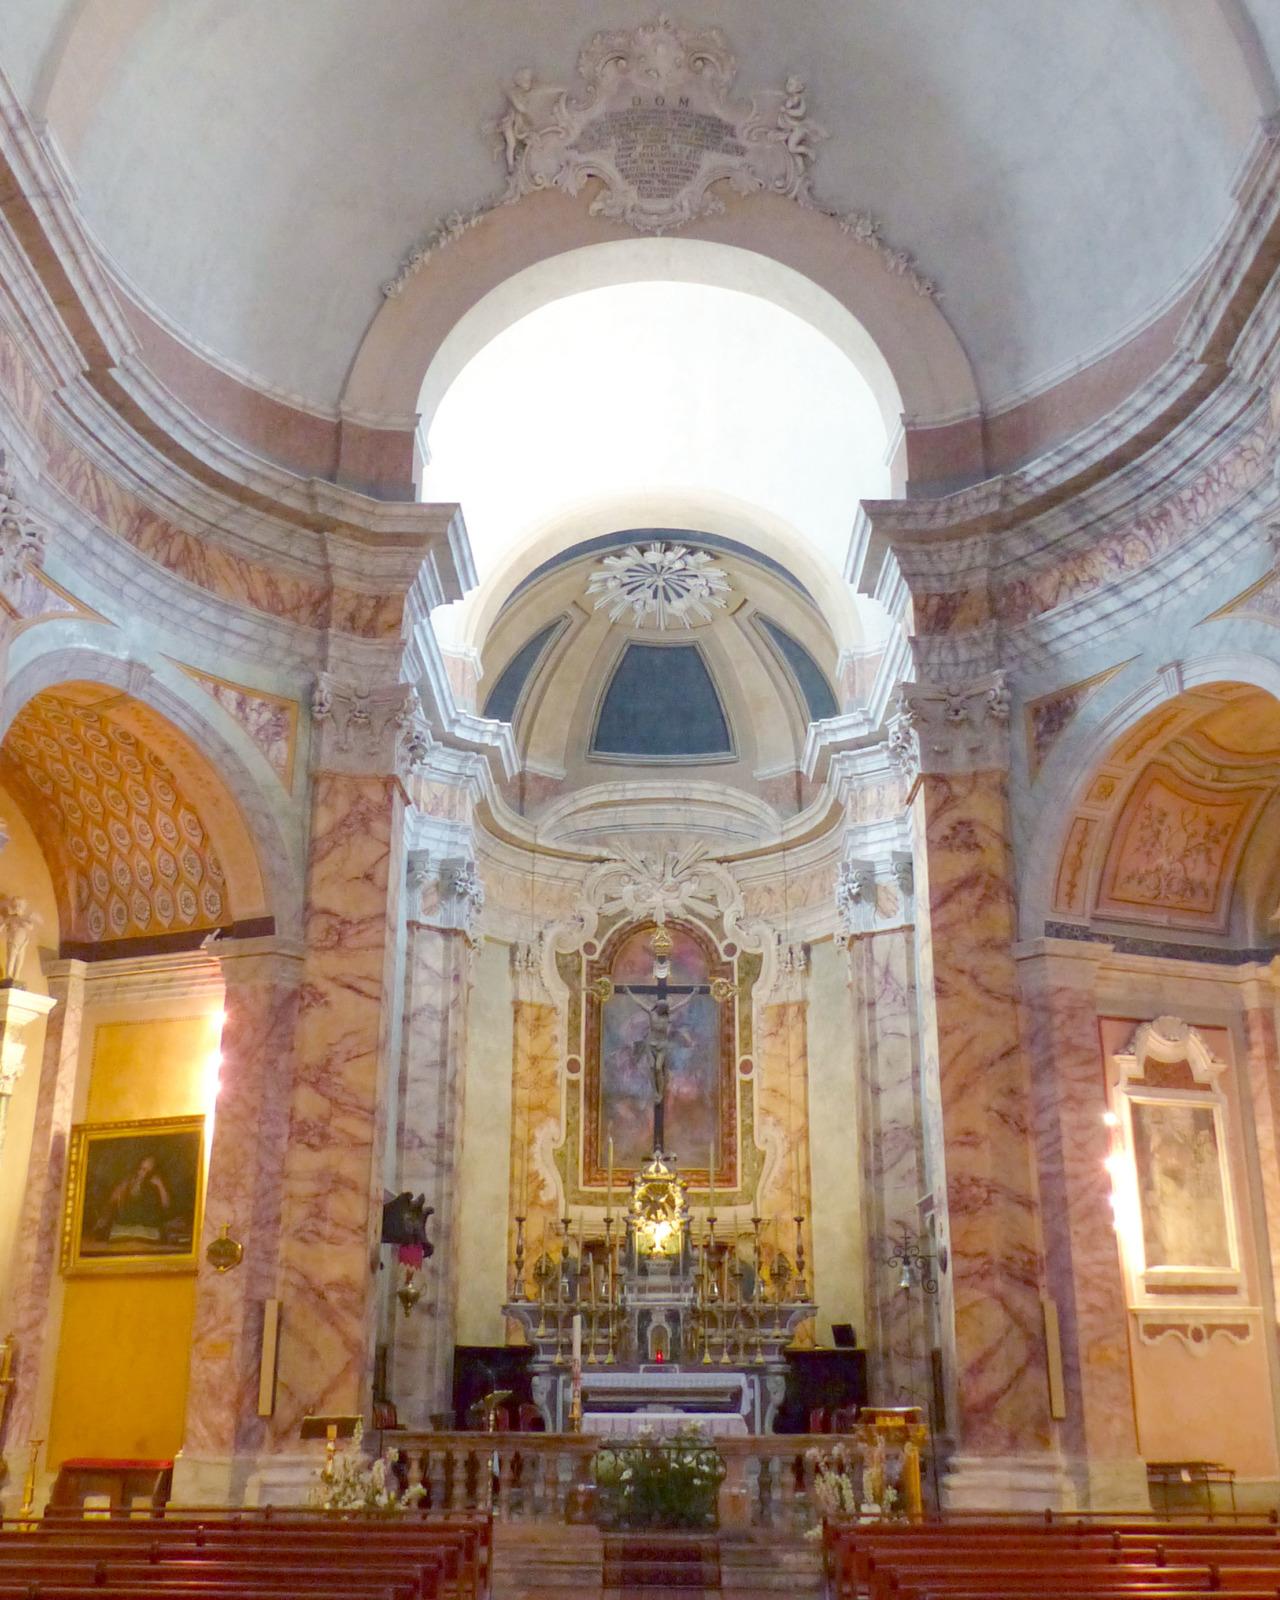 Inside the Saint Michel church of La Turbie © Finoskov - licence [CC BY-SA 4.0] from Wikimedia Commons